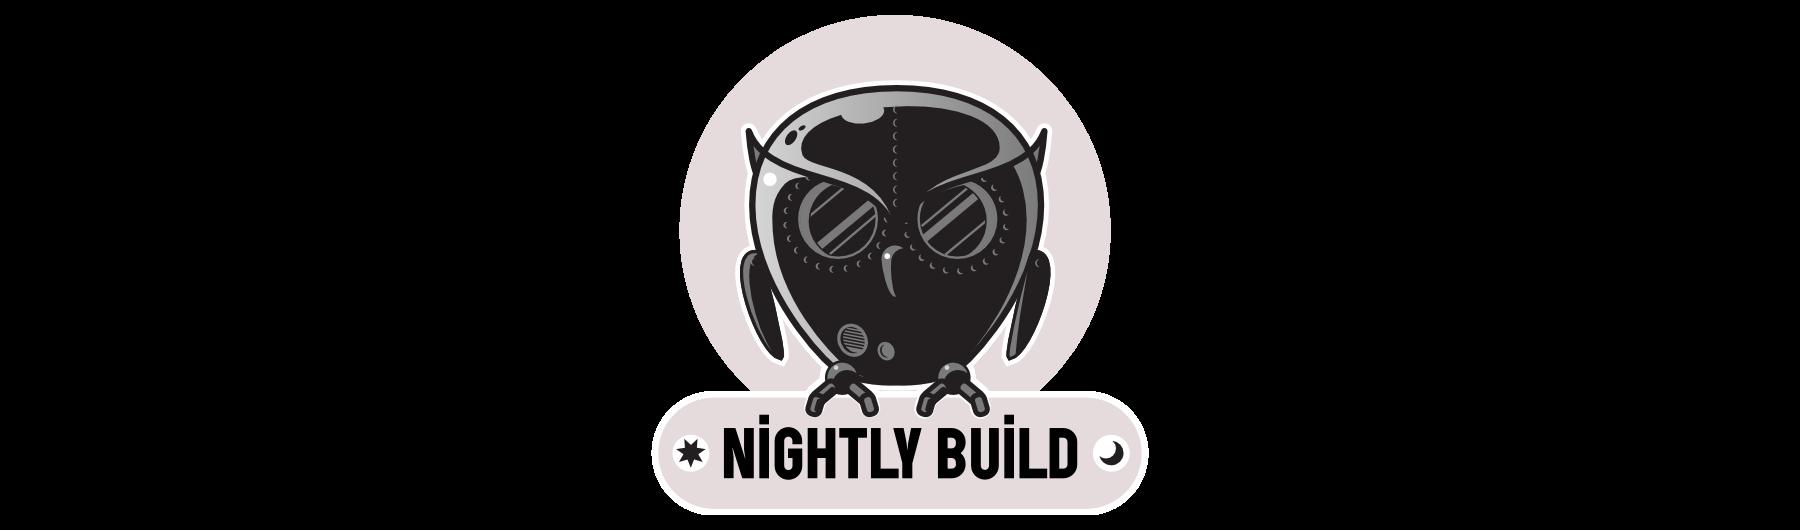 NightlyBuild 2017